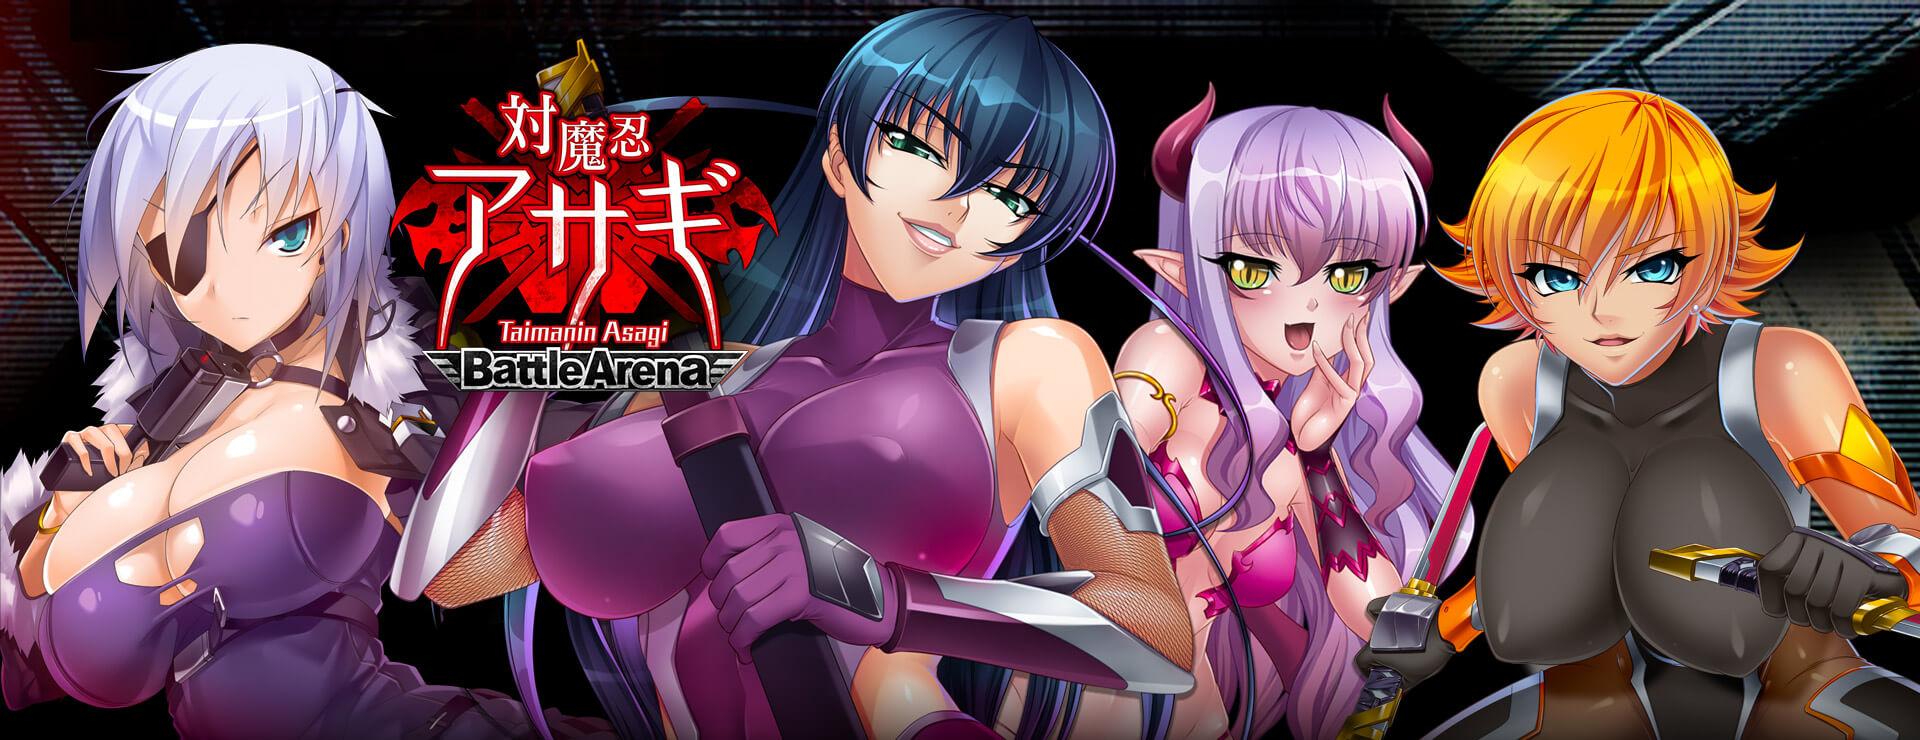 Taimanin Asagi -Battle Arena- - RPG Game